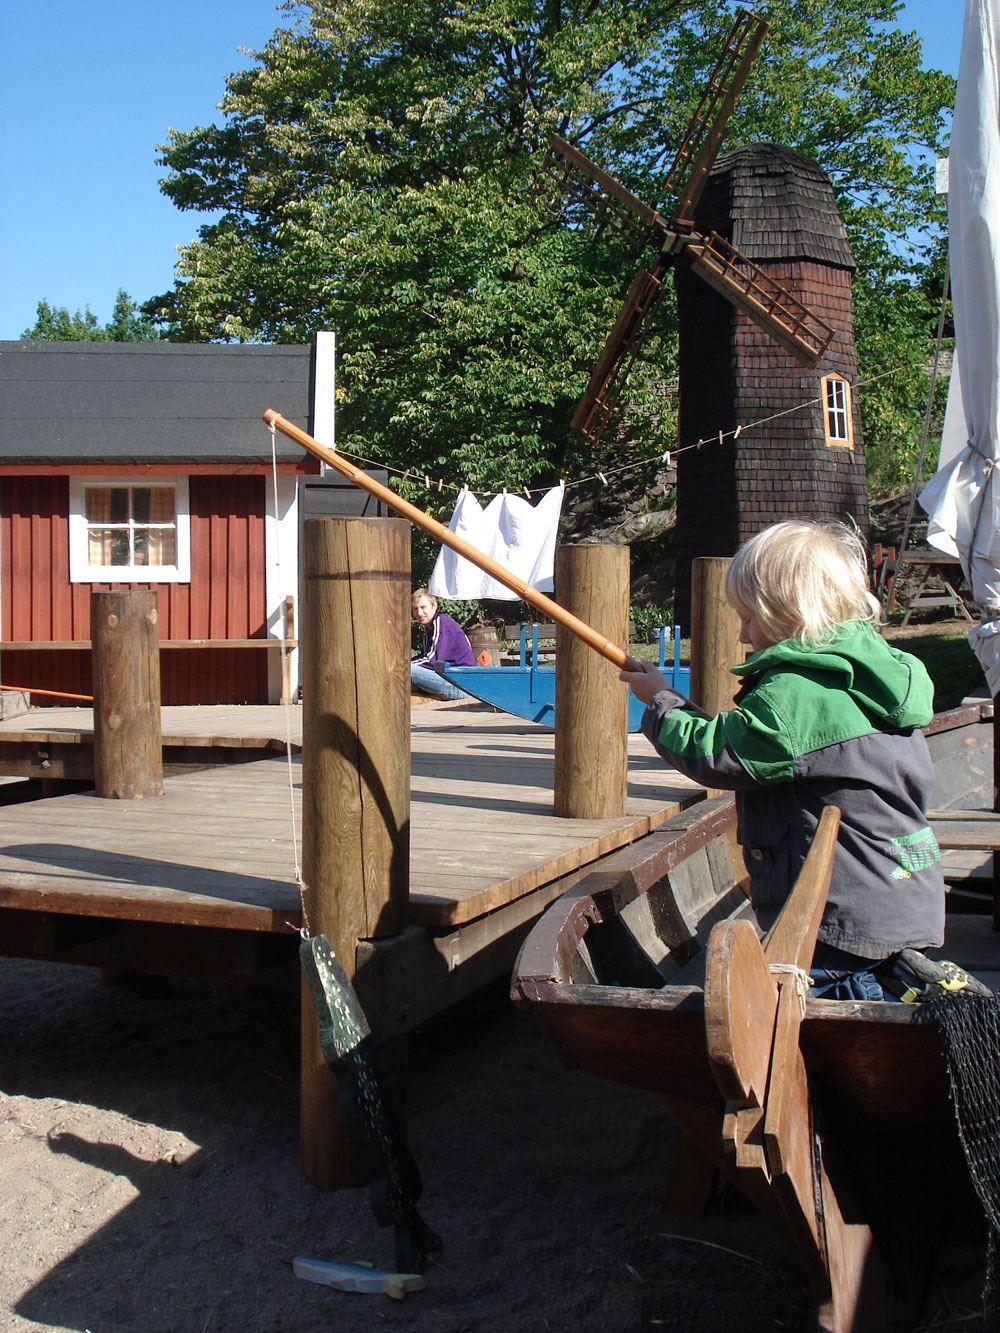 Playground Grevagrundet